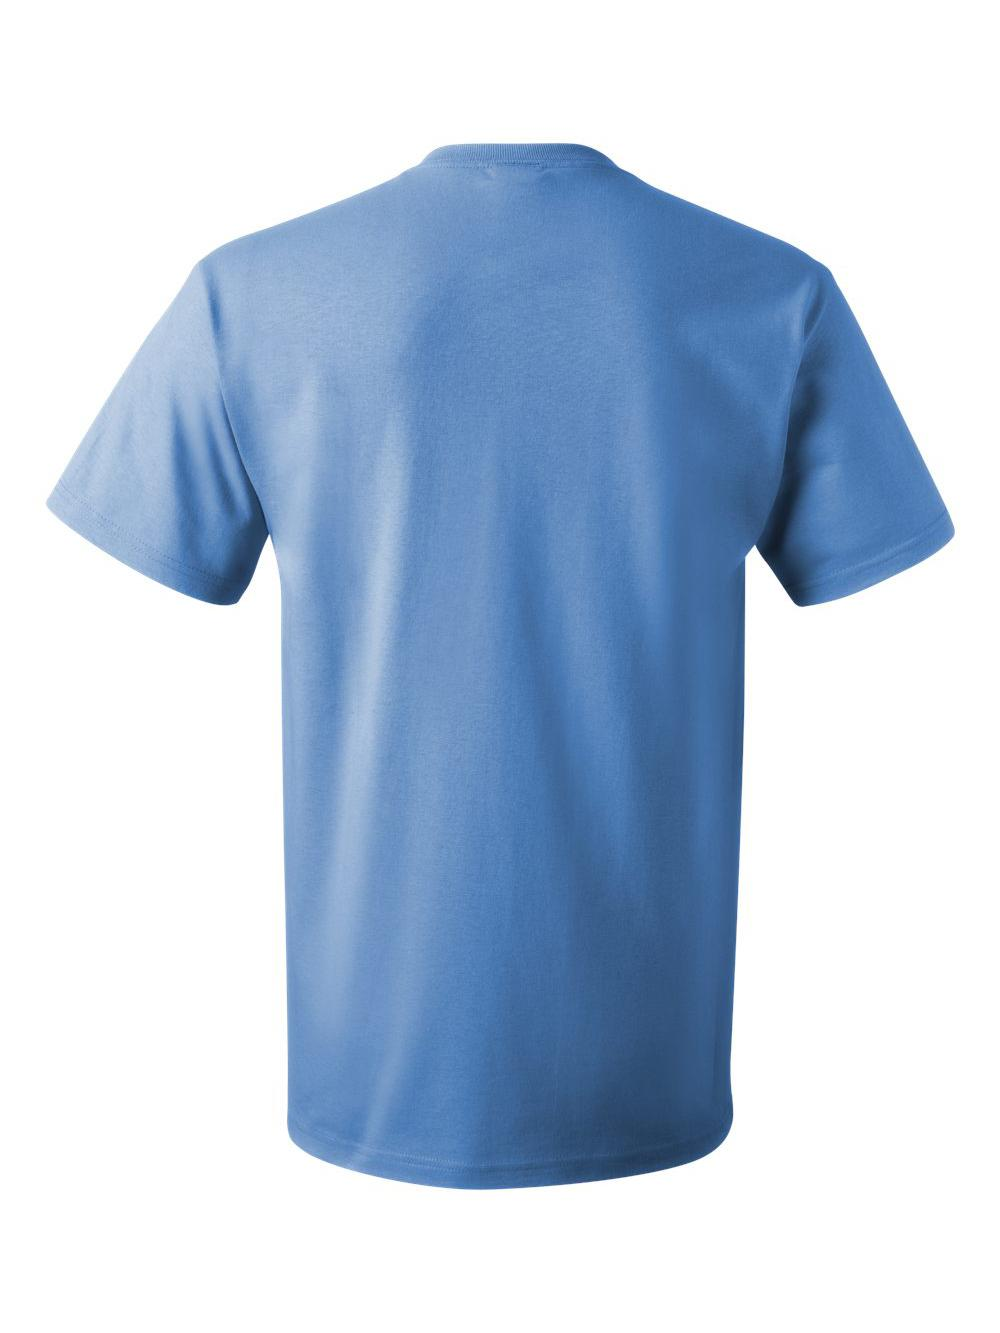 Fruit-of-the-Loom-HD-Cotton-Short-Sleeve-T-Shirt-3930R thumbnail 37